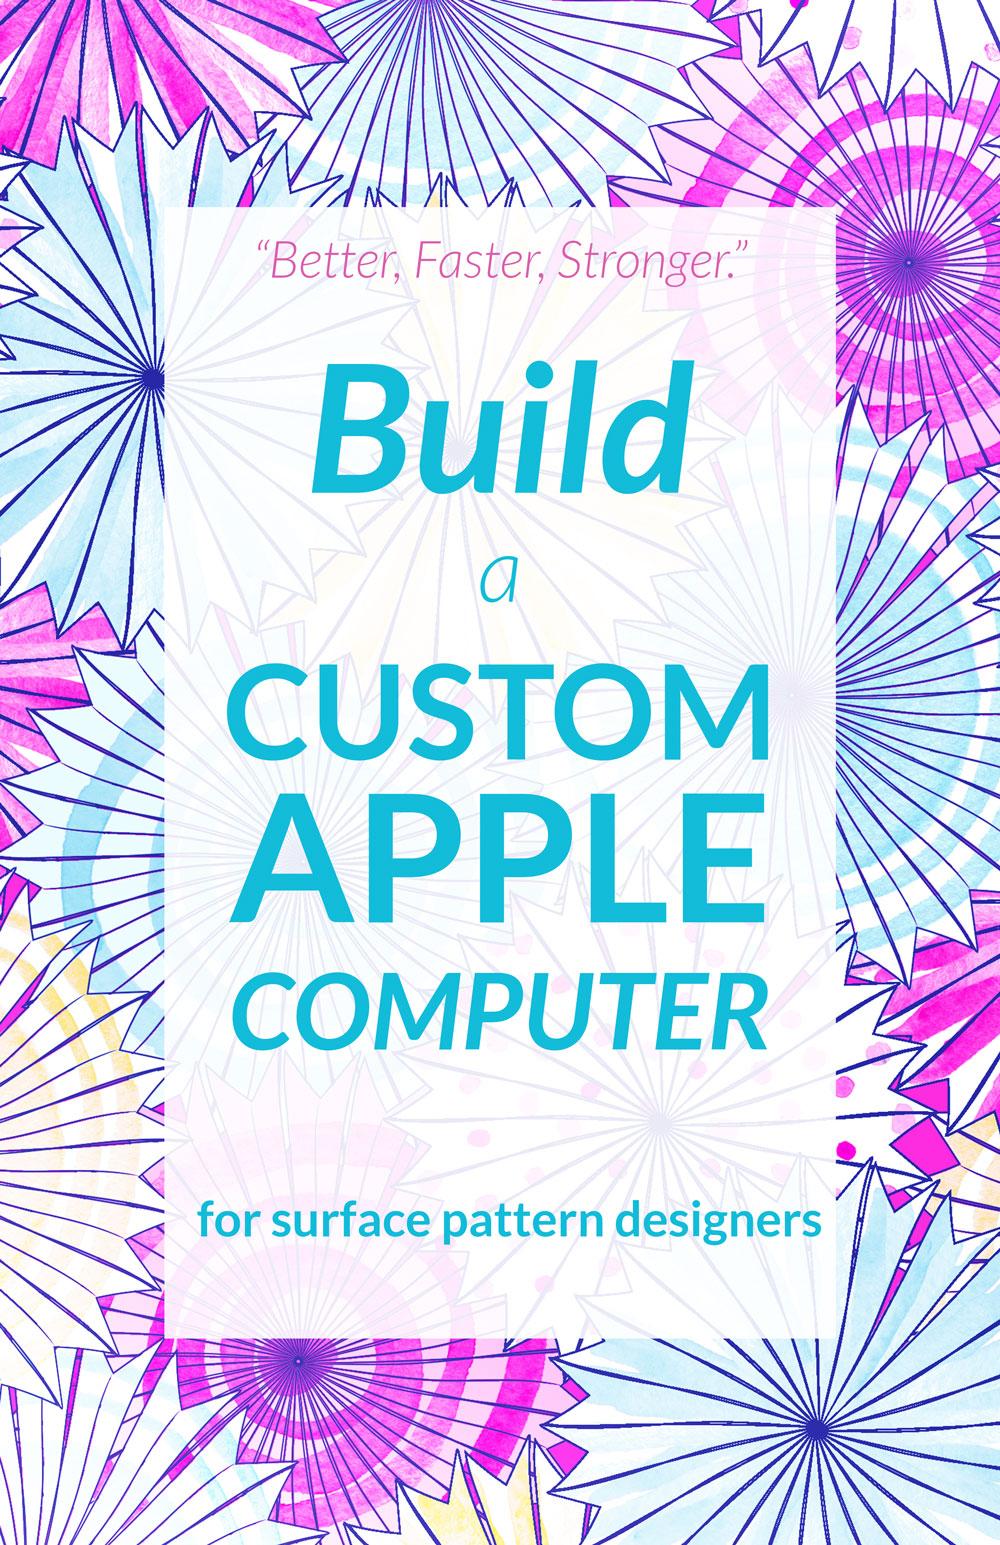 Build a custom Apple Machine using a Hackintosh